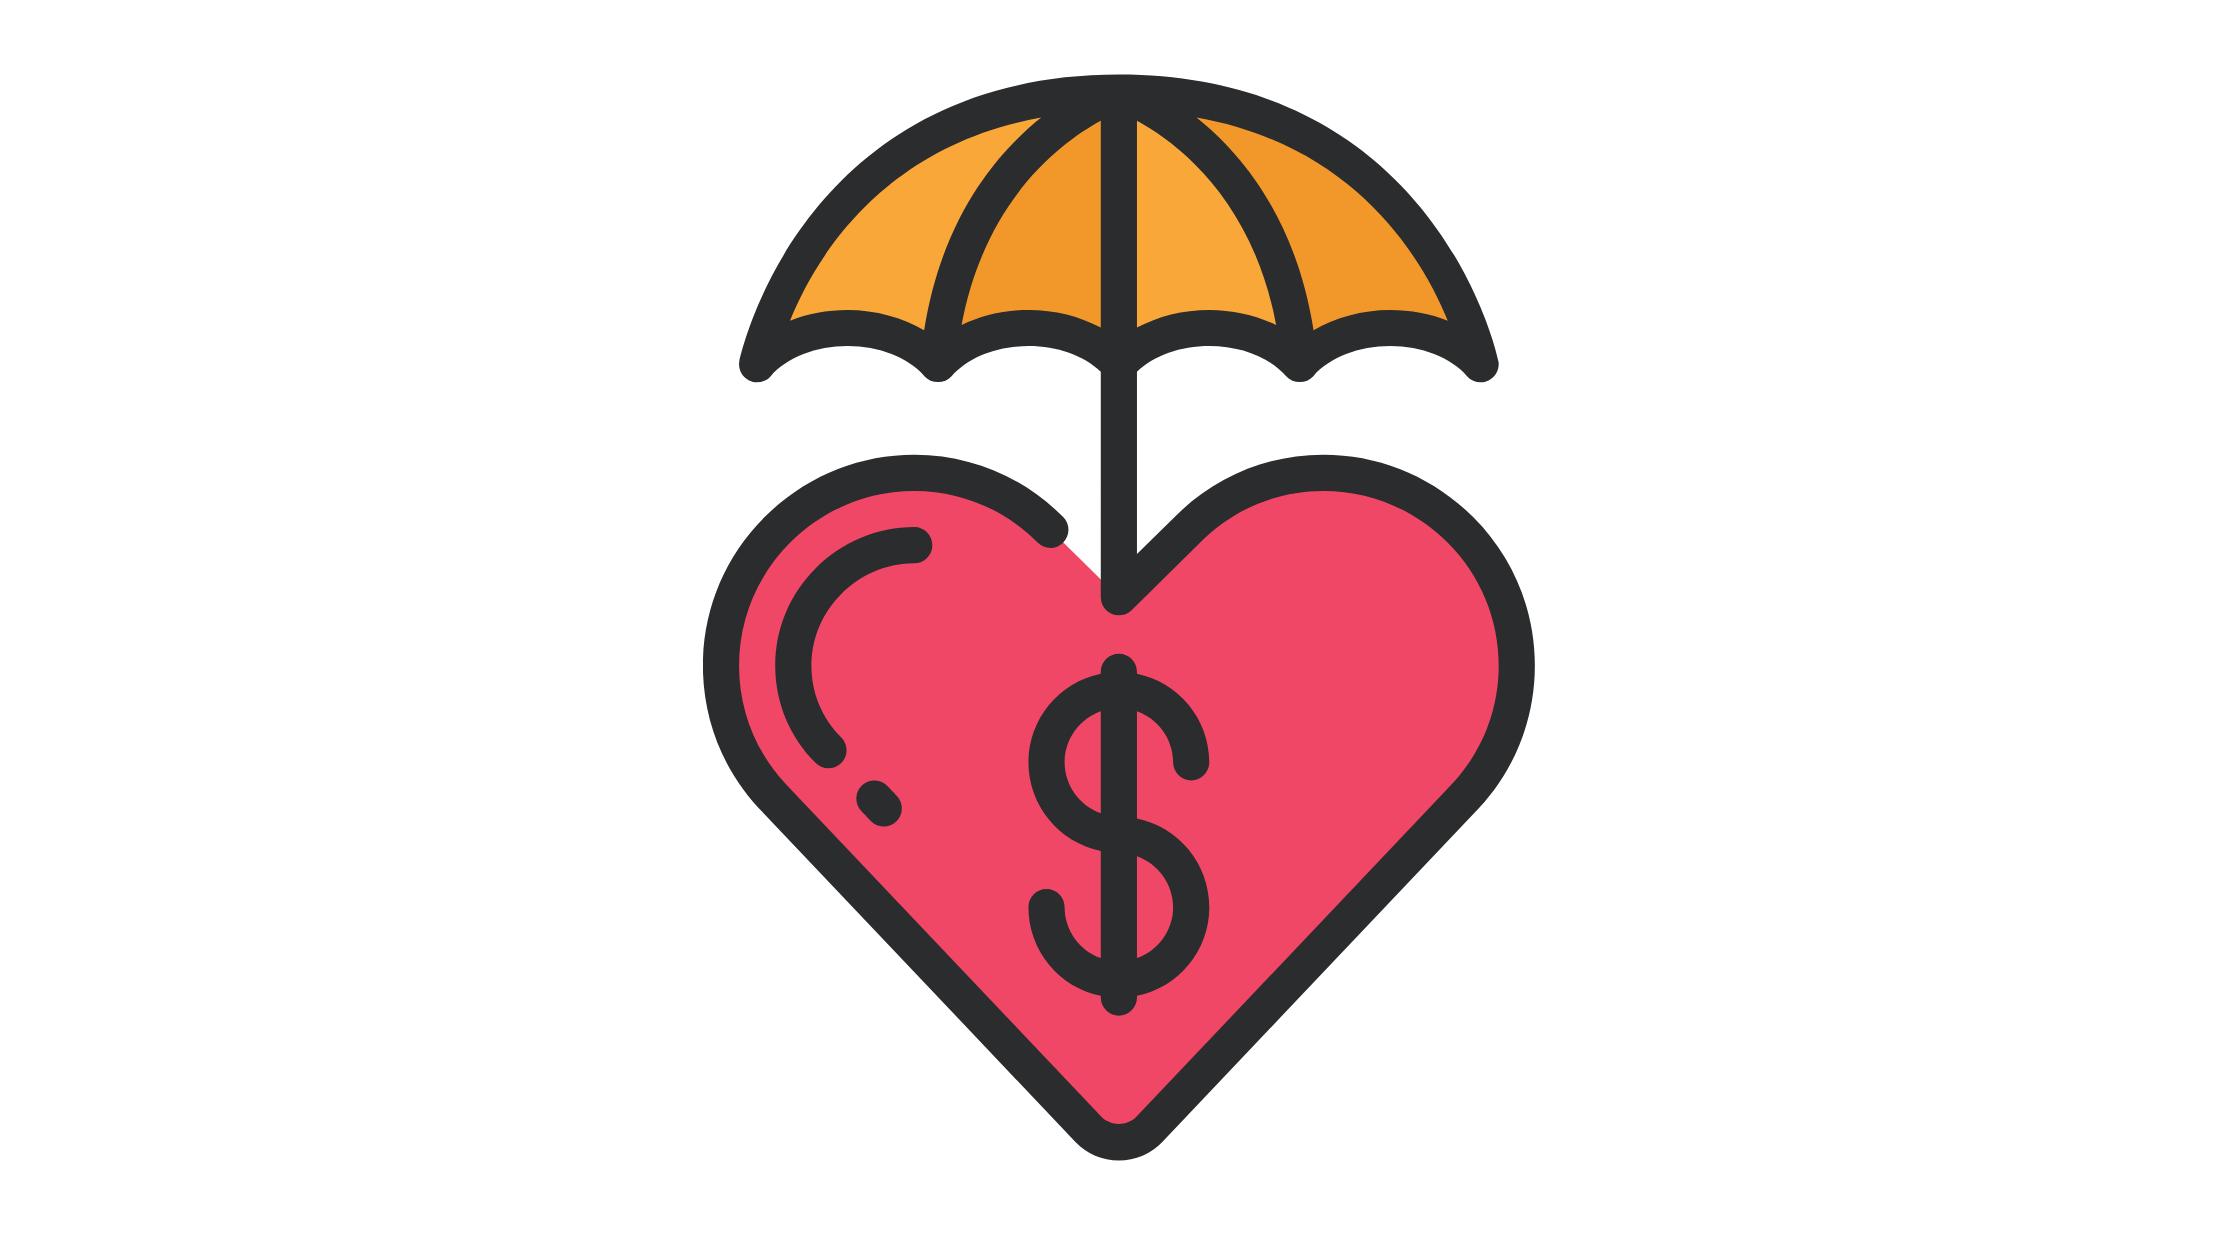 American Retirement Life Insurance Company